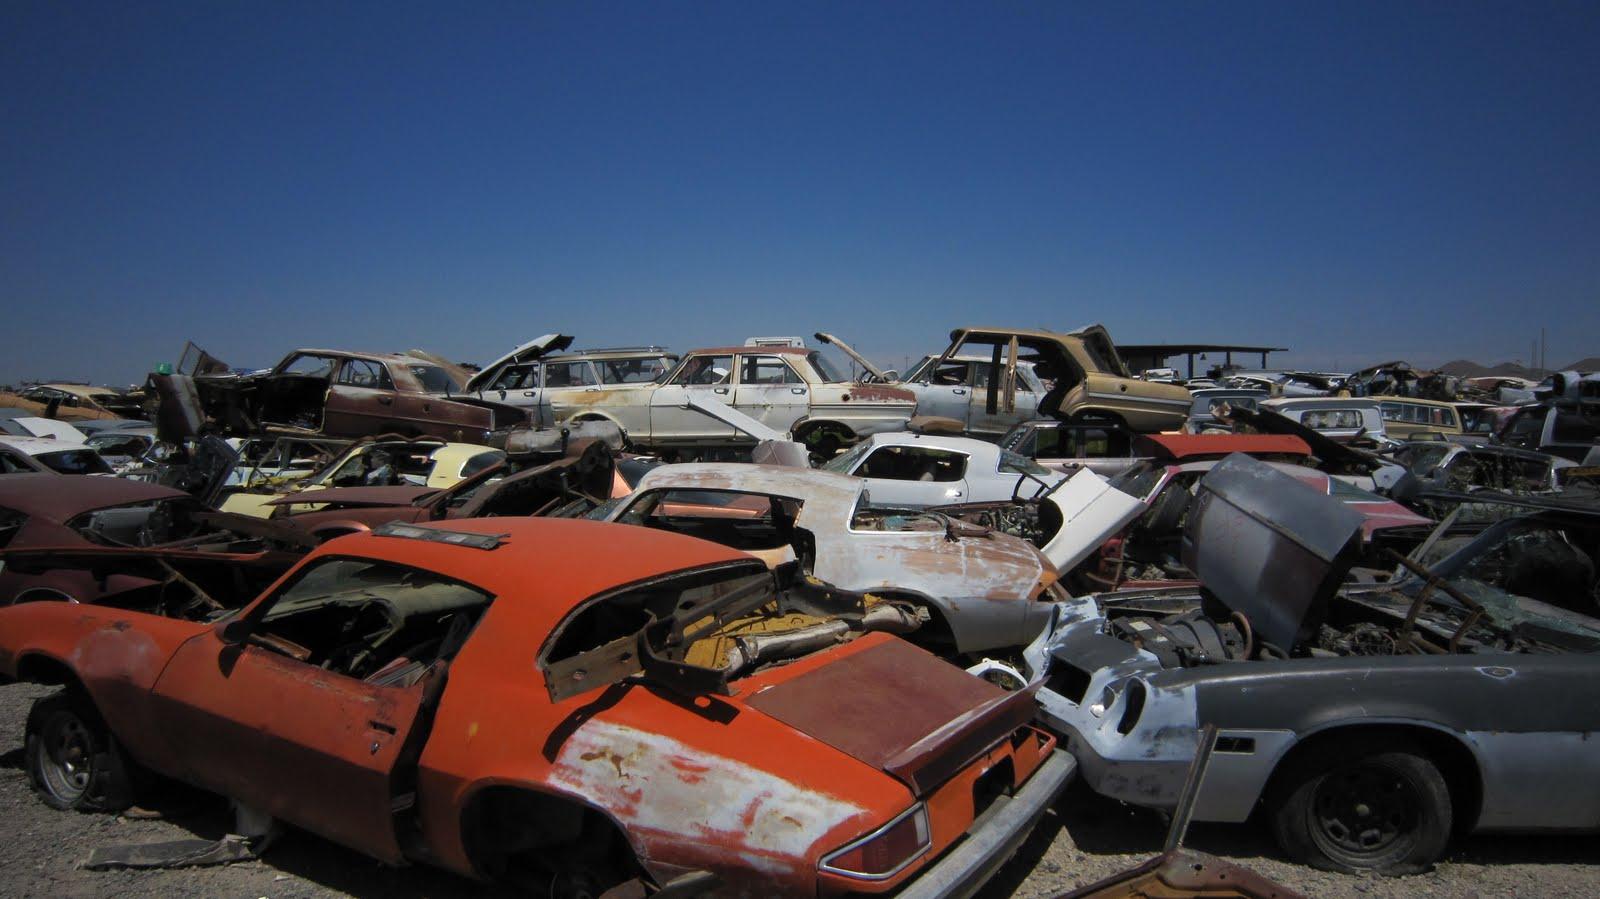 Wegi`s World: Visiting DVAP (Desert Valley Auto Parts)